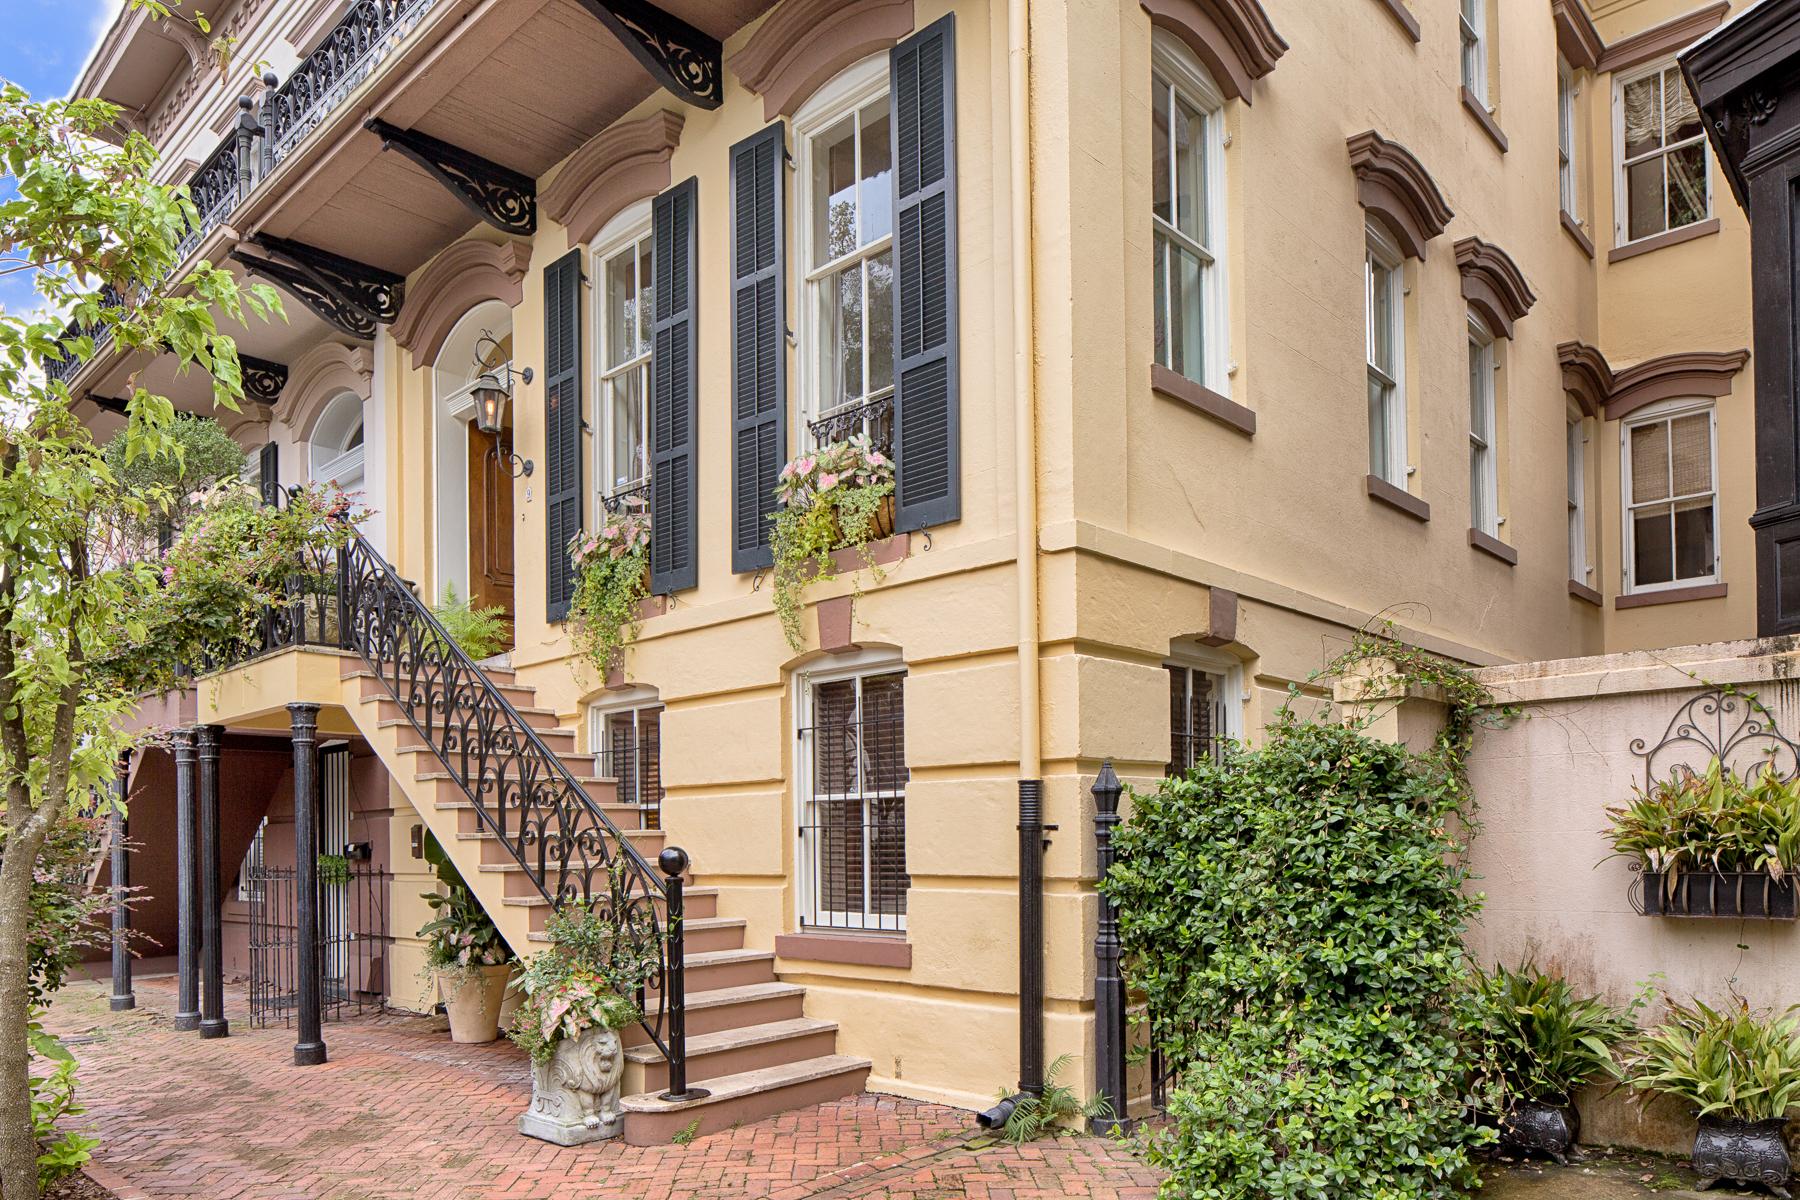 Villa per Vendita alle ore 9 West Gordon Street 9 West Gordon Street Savannah, Georgia 31401 Stati Uniti